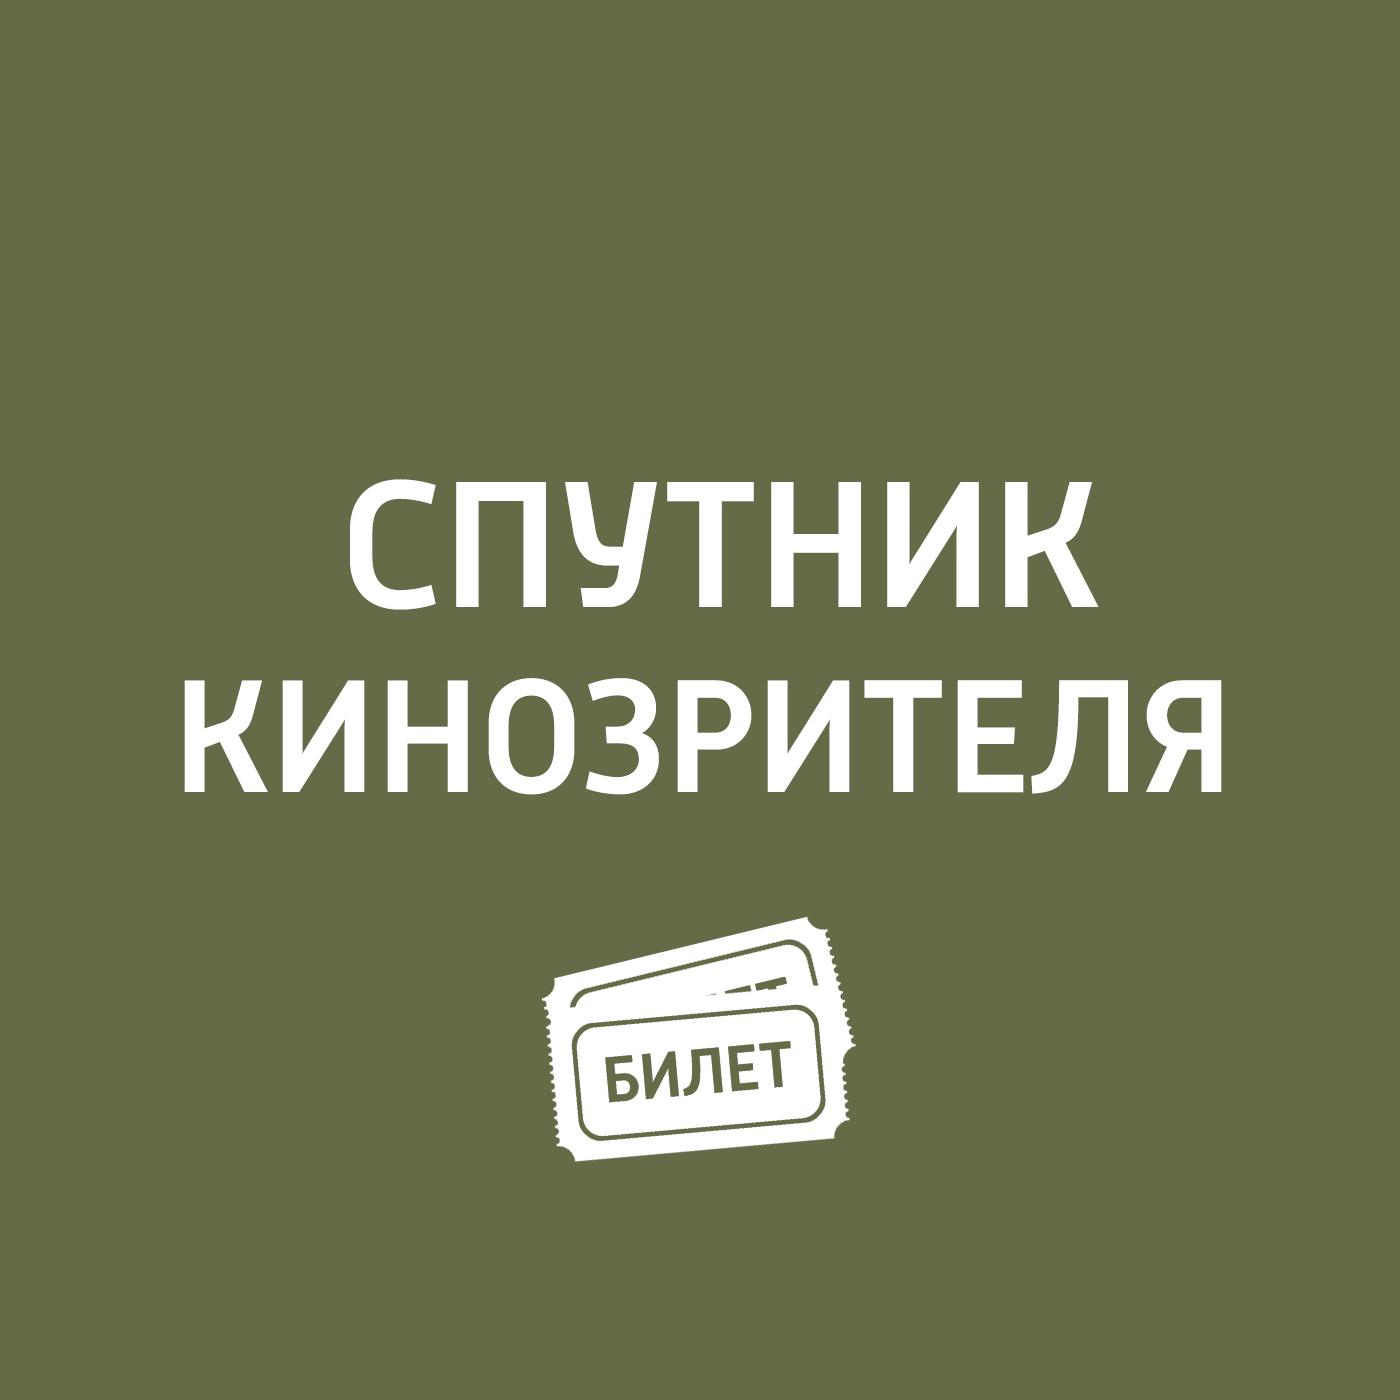 Антон Долин «Дикая жизнь», «Примадонна», «Хэллоуин»